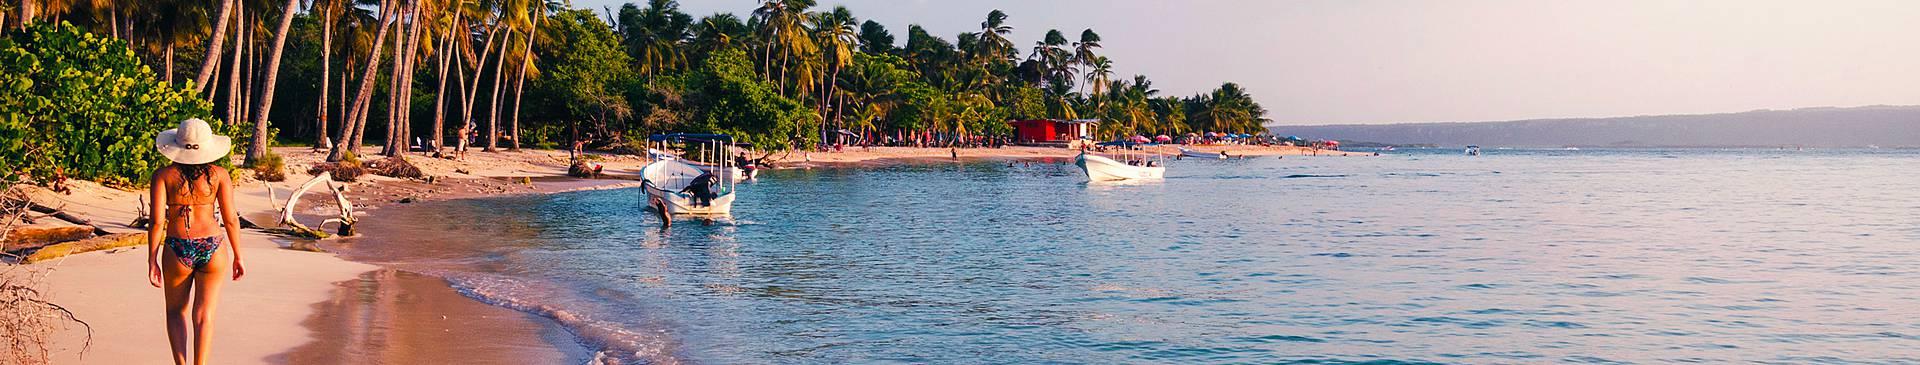 Voyage plage au Venezuela